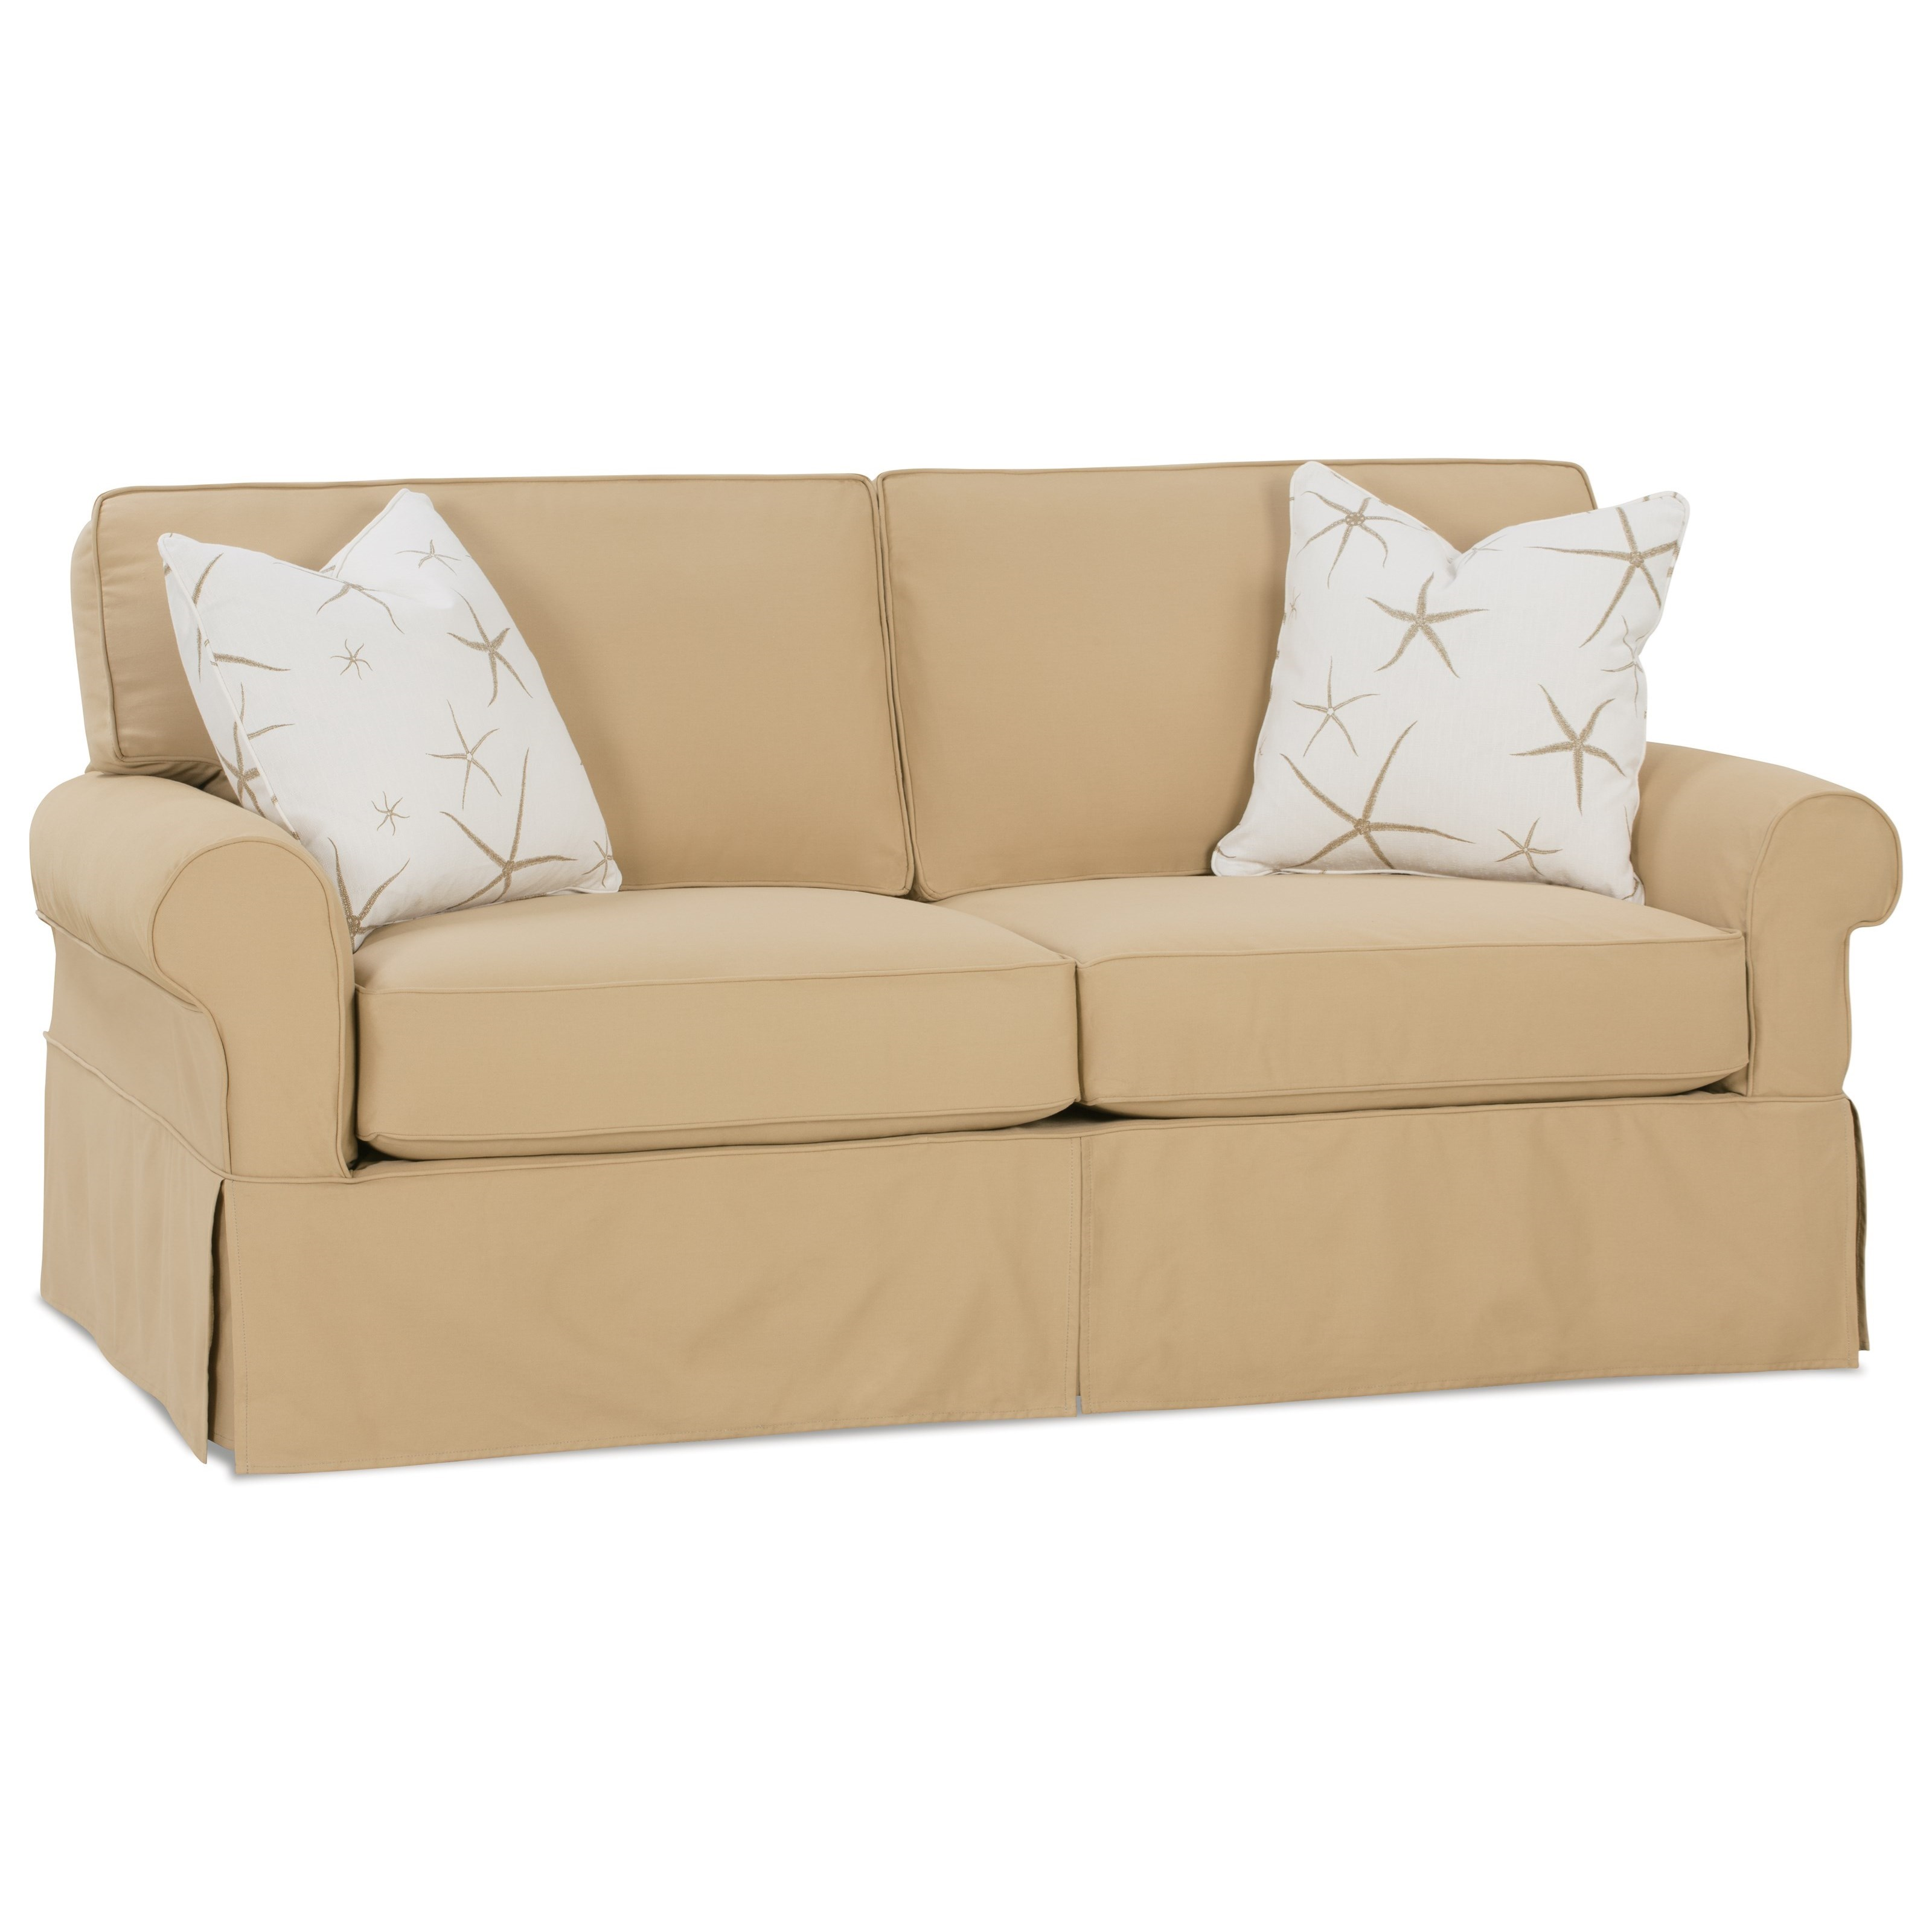 Two Cushion Slipcover Sofa